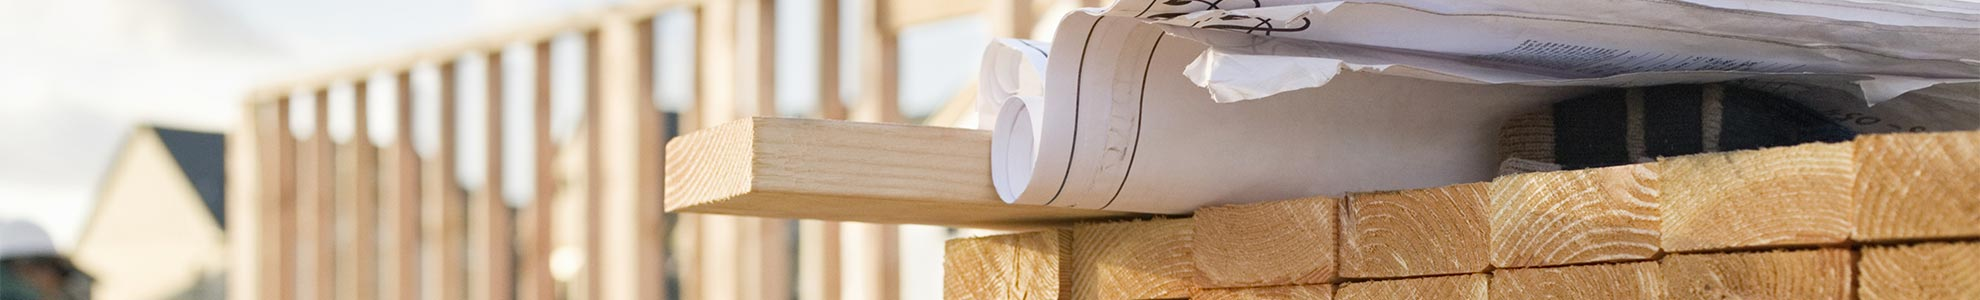 Statybinbė mediena